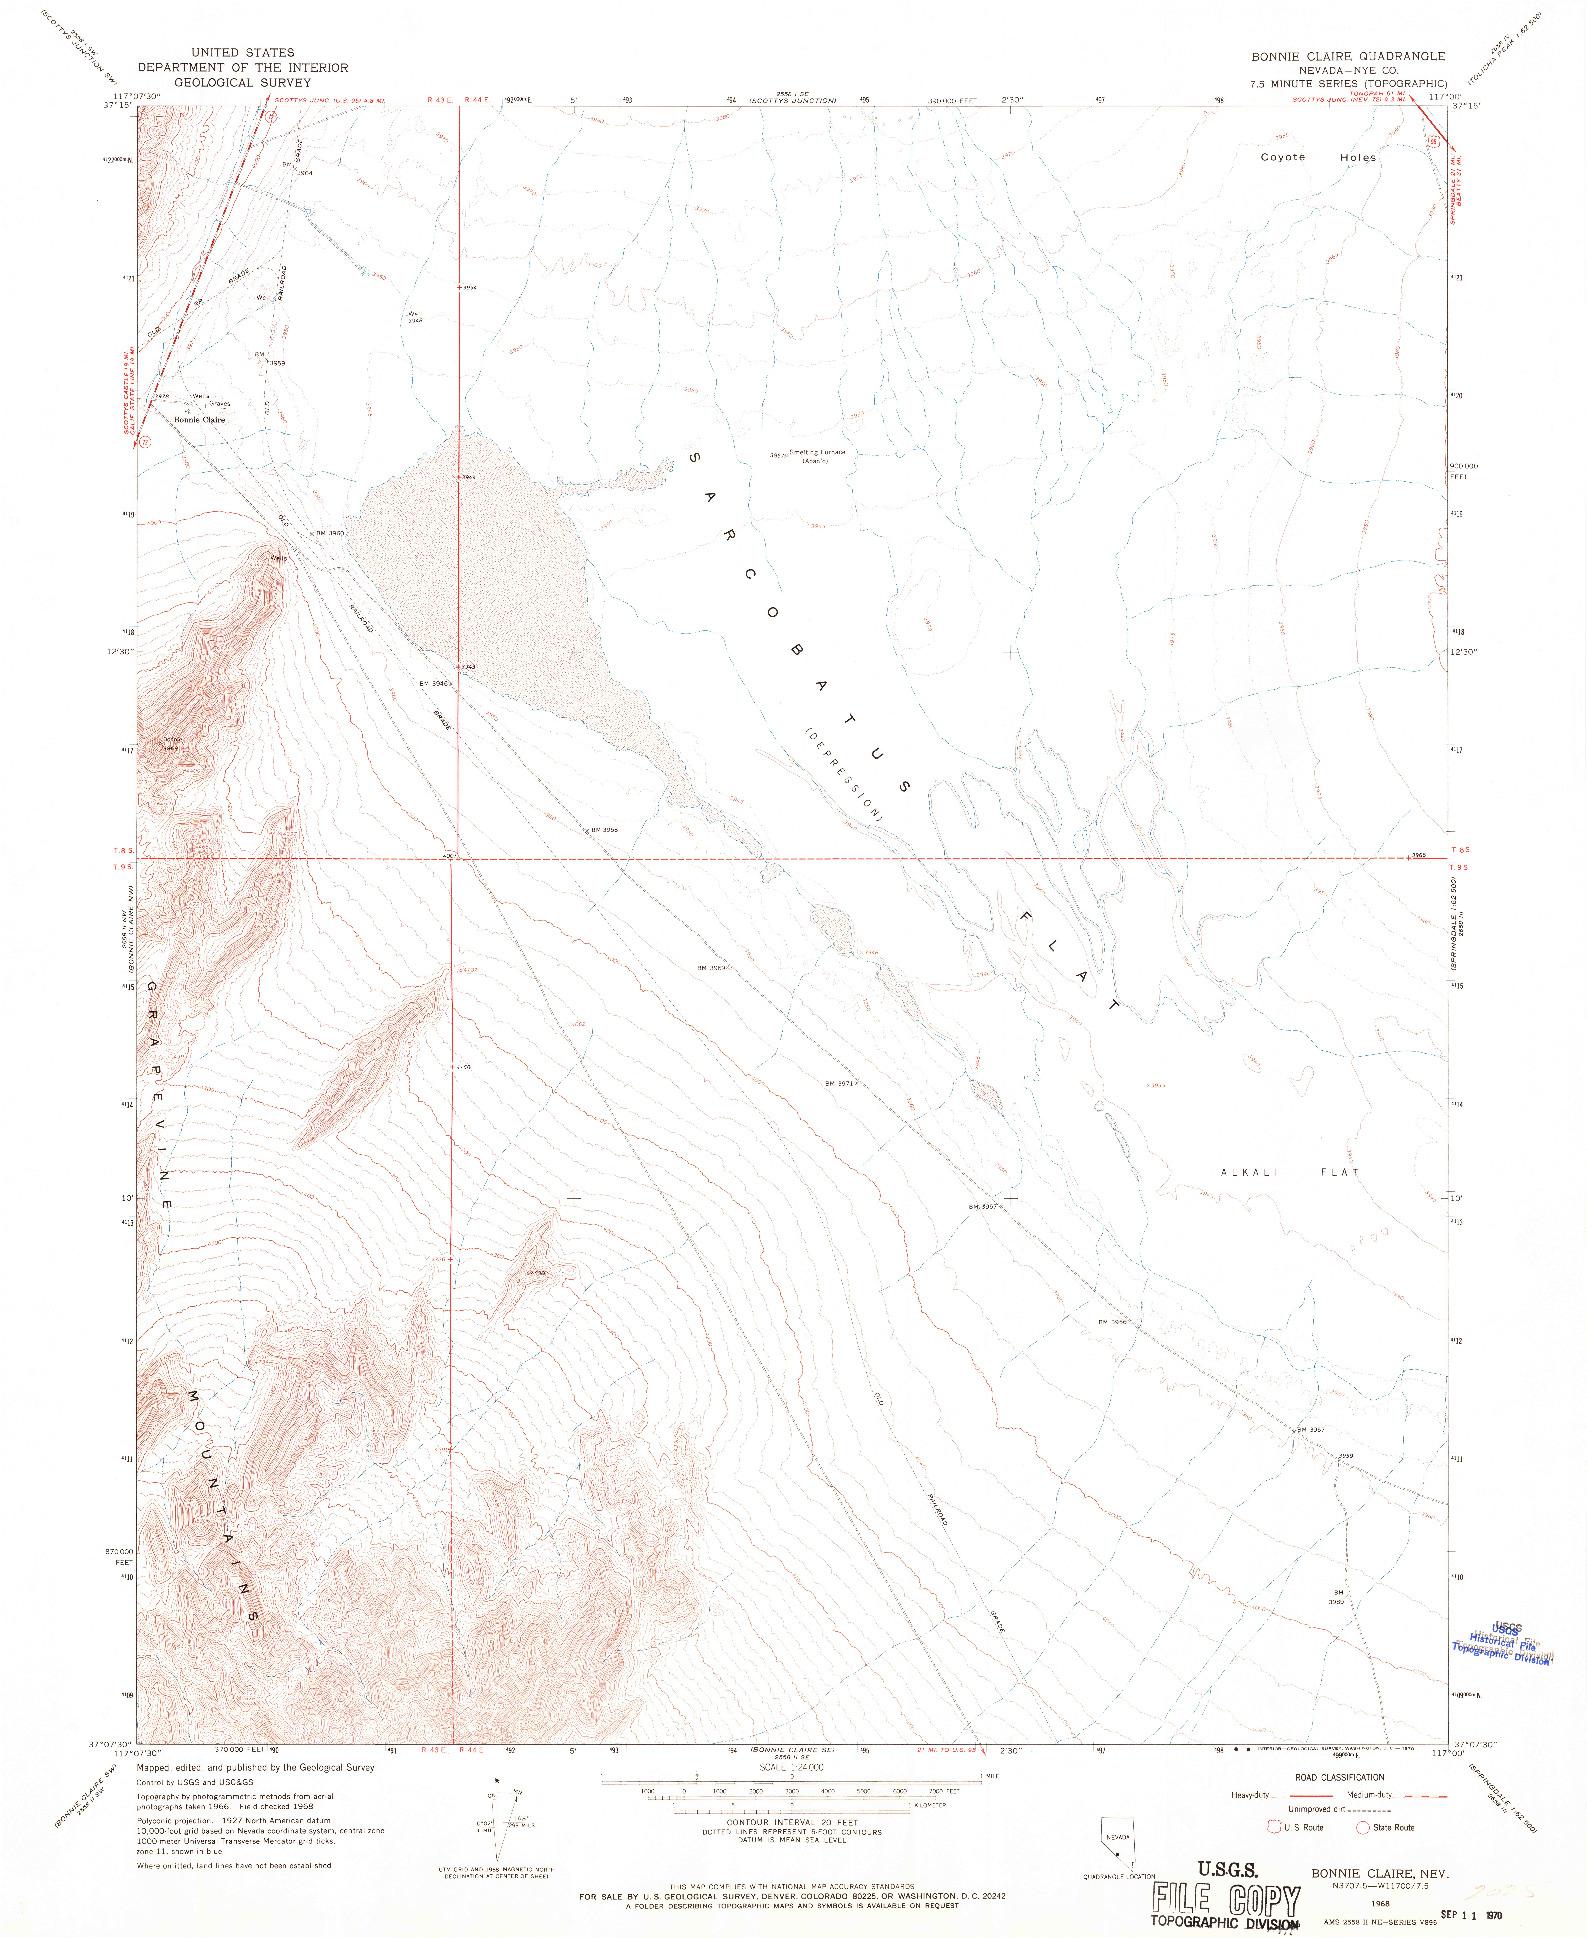 USGS 1:24000-SCALE QUADRANGLE FOR BONNIE CLAIRE, NV 1968